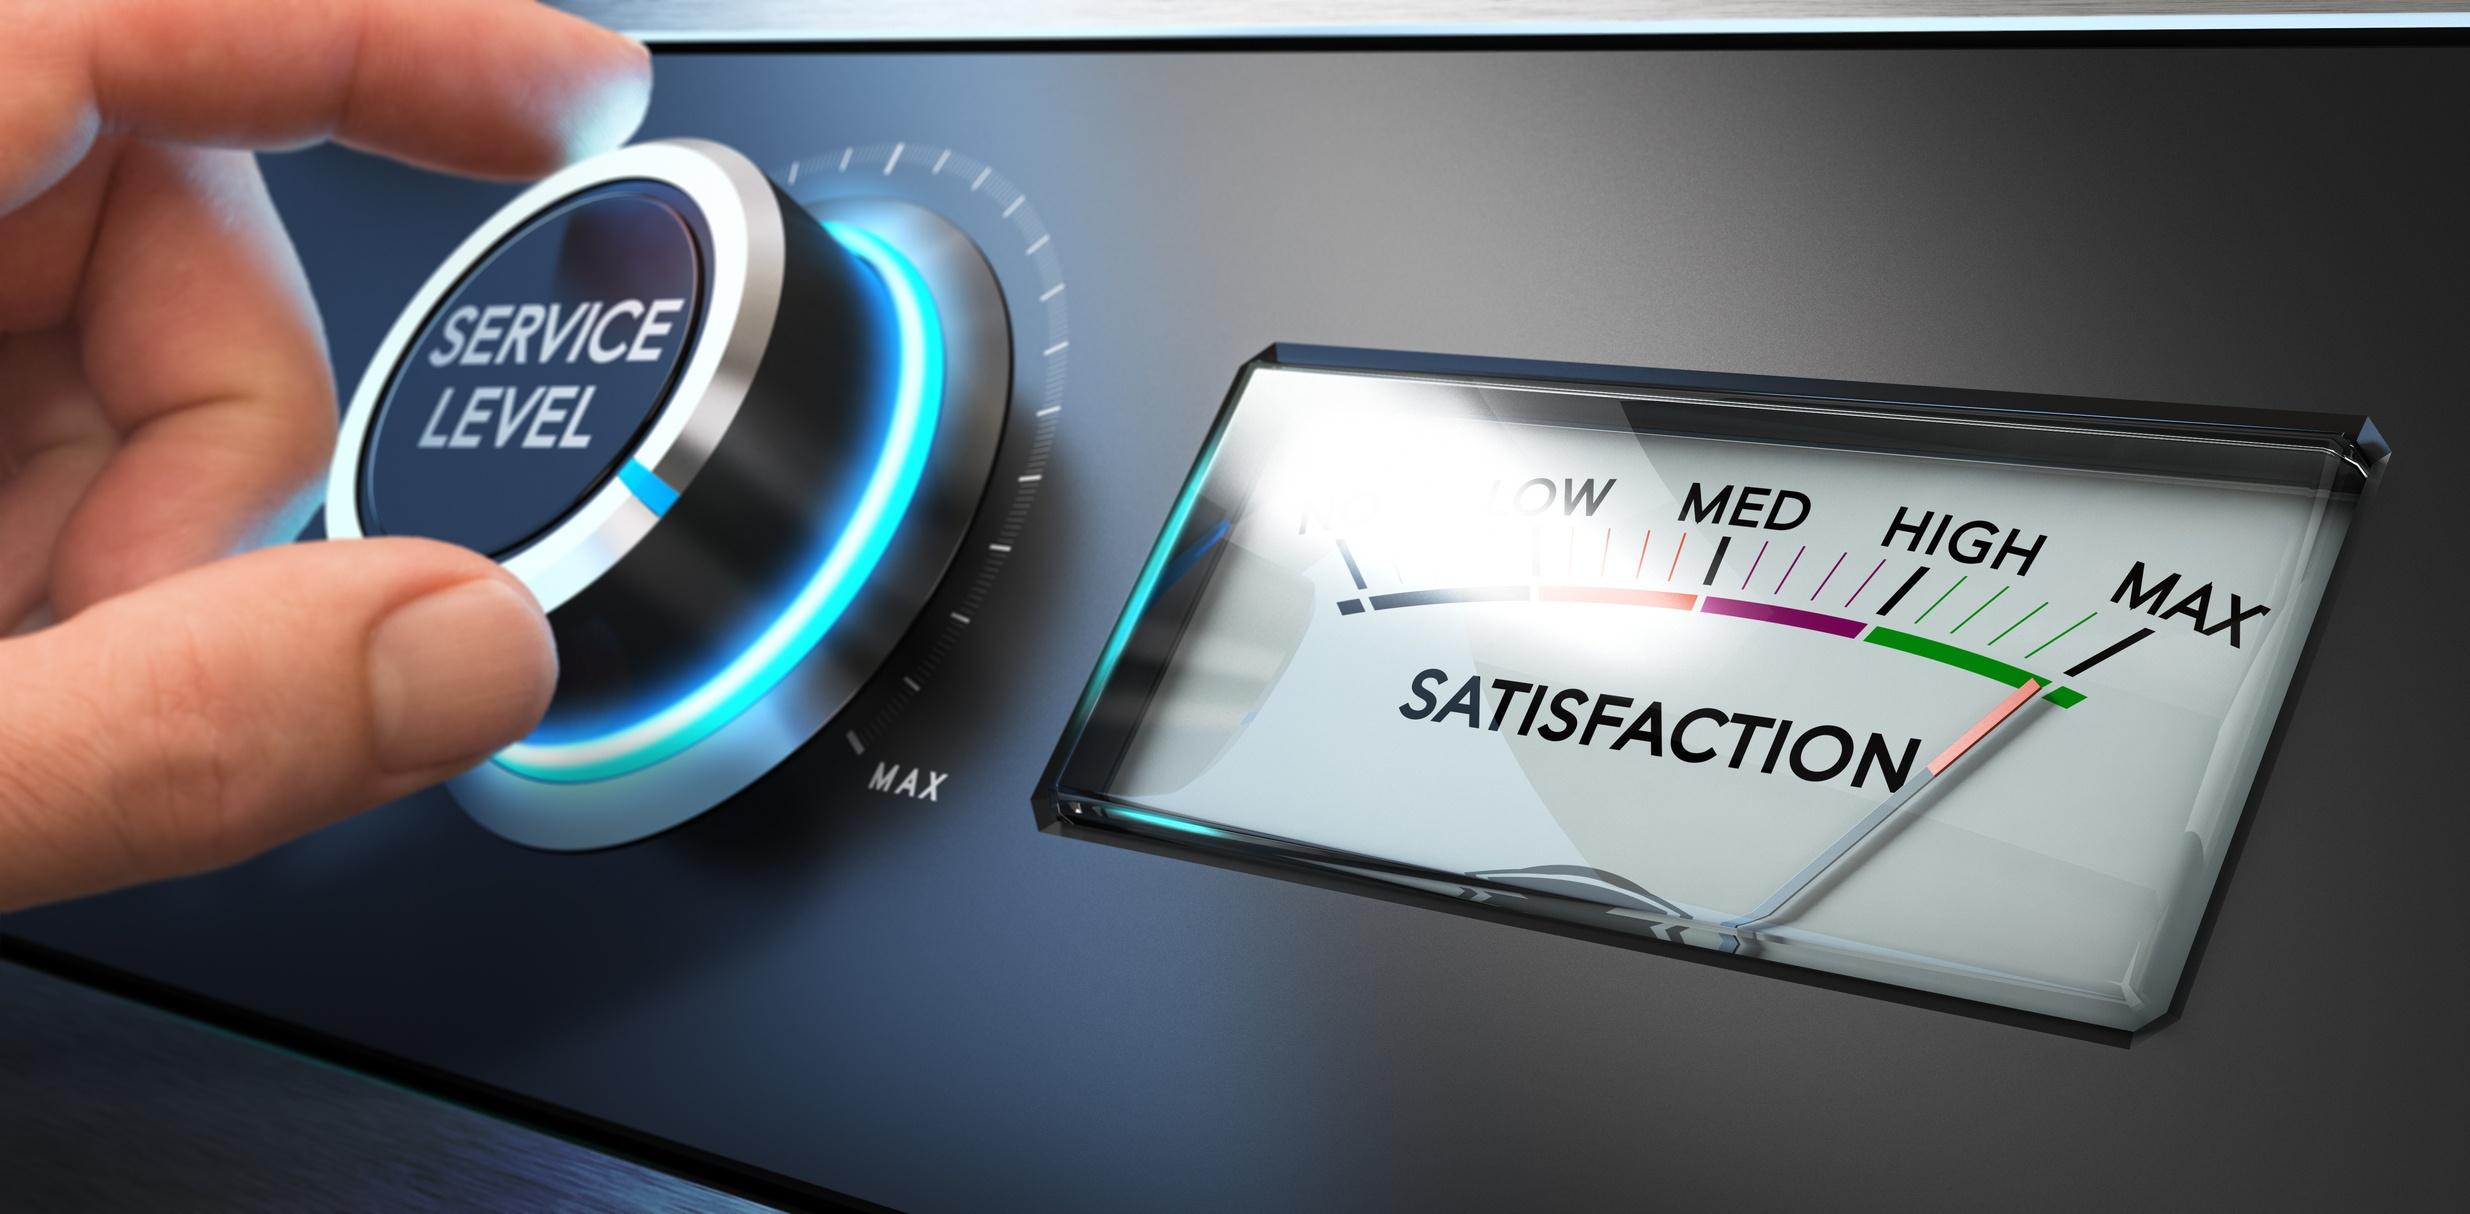 weedpro-customer-service-reviews.jpg